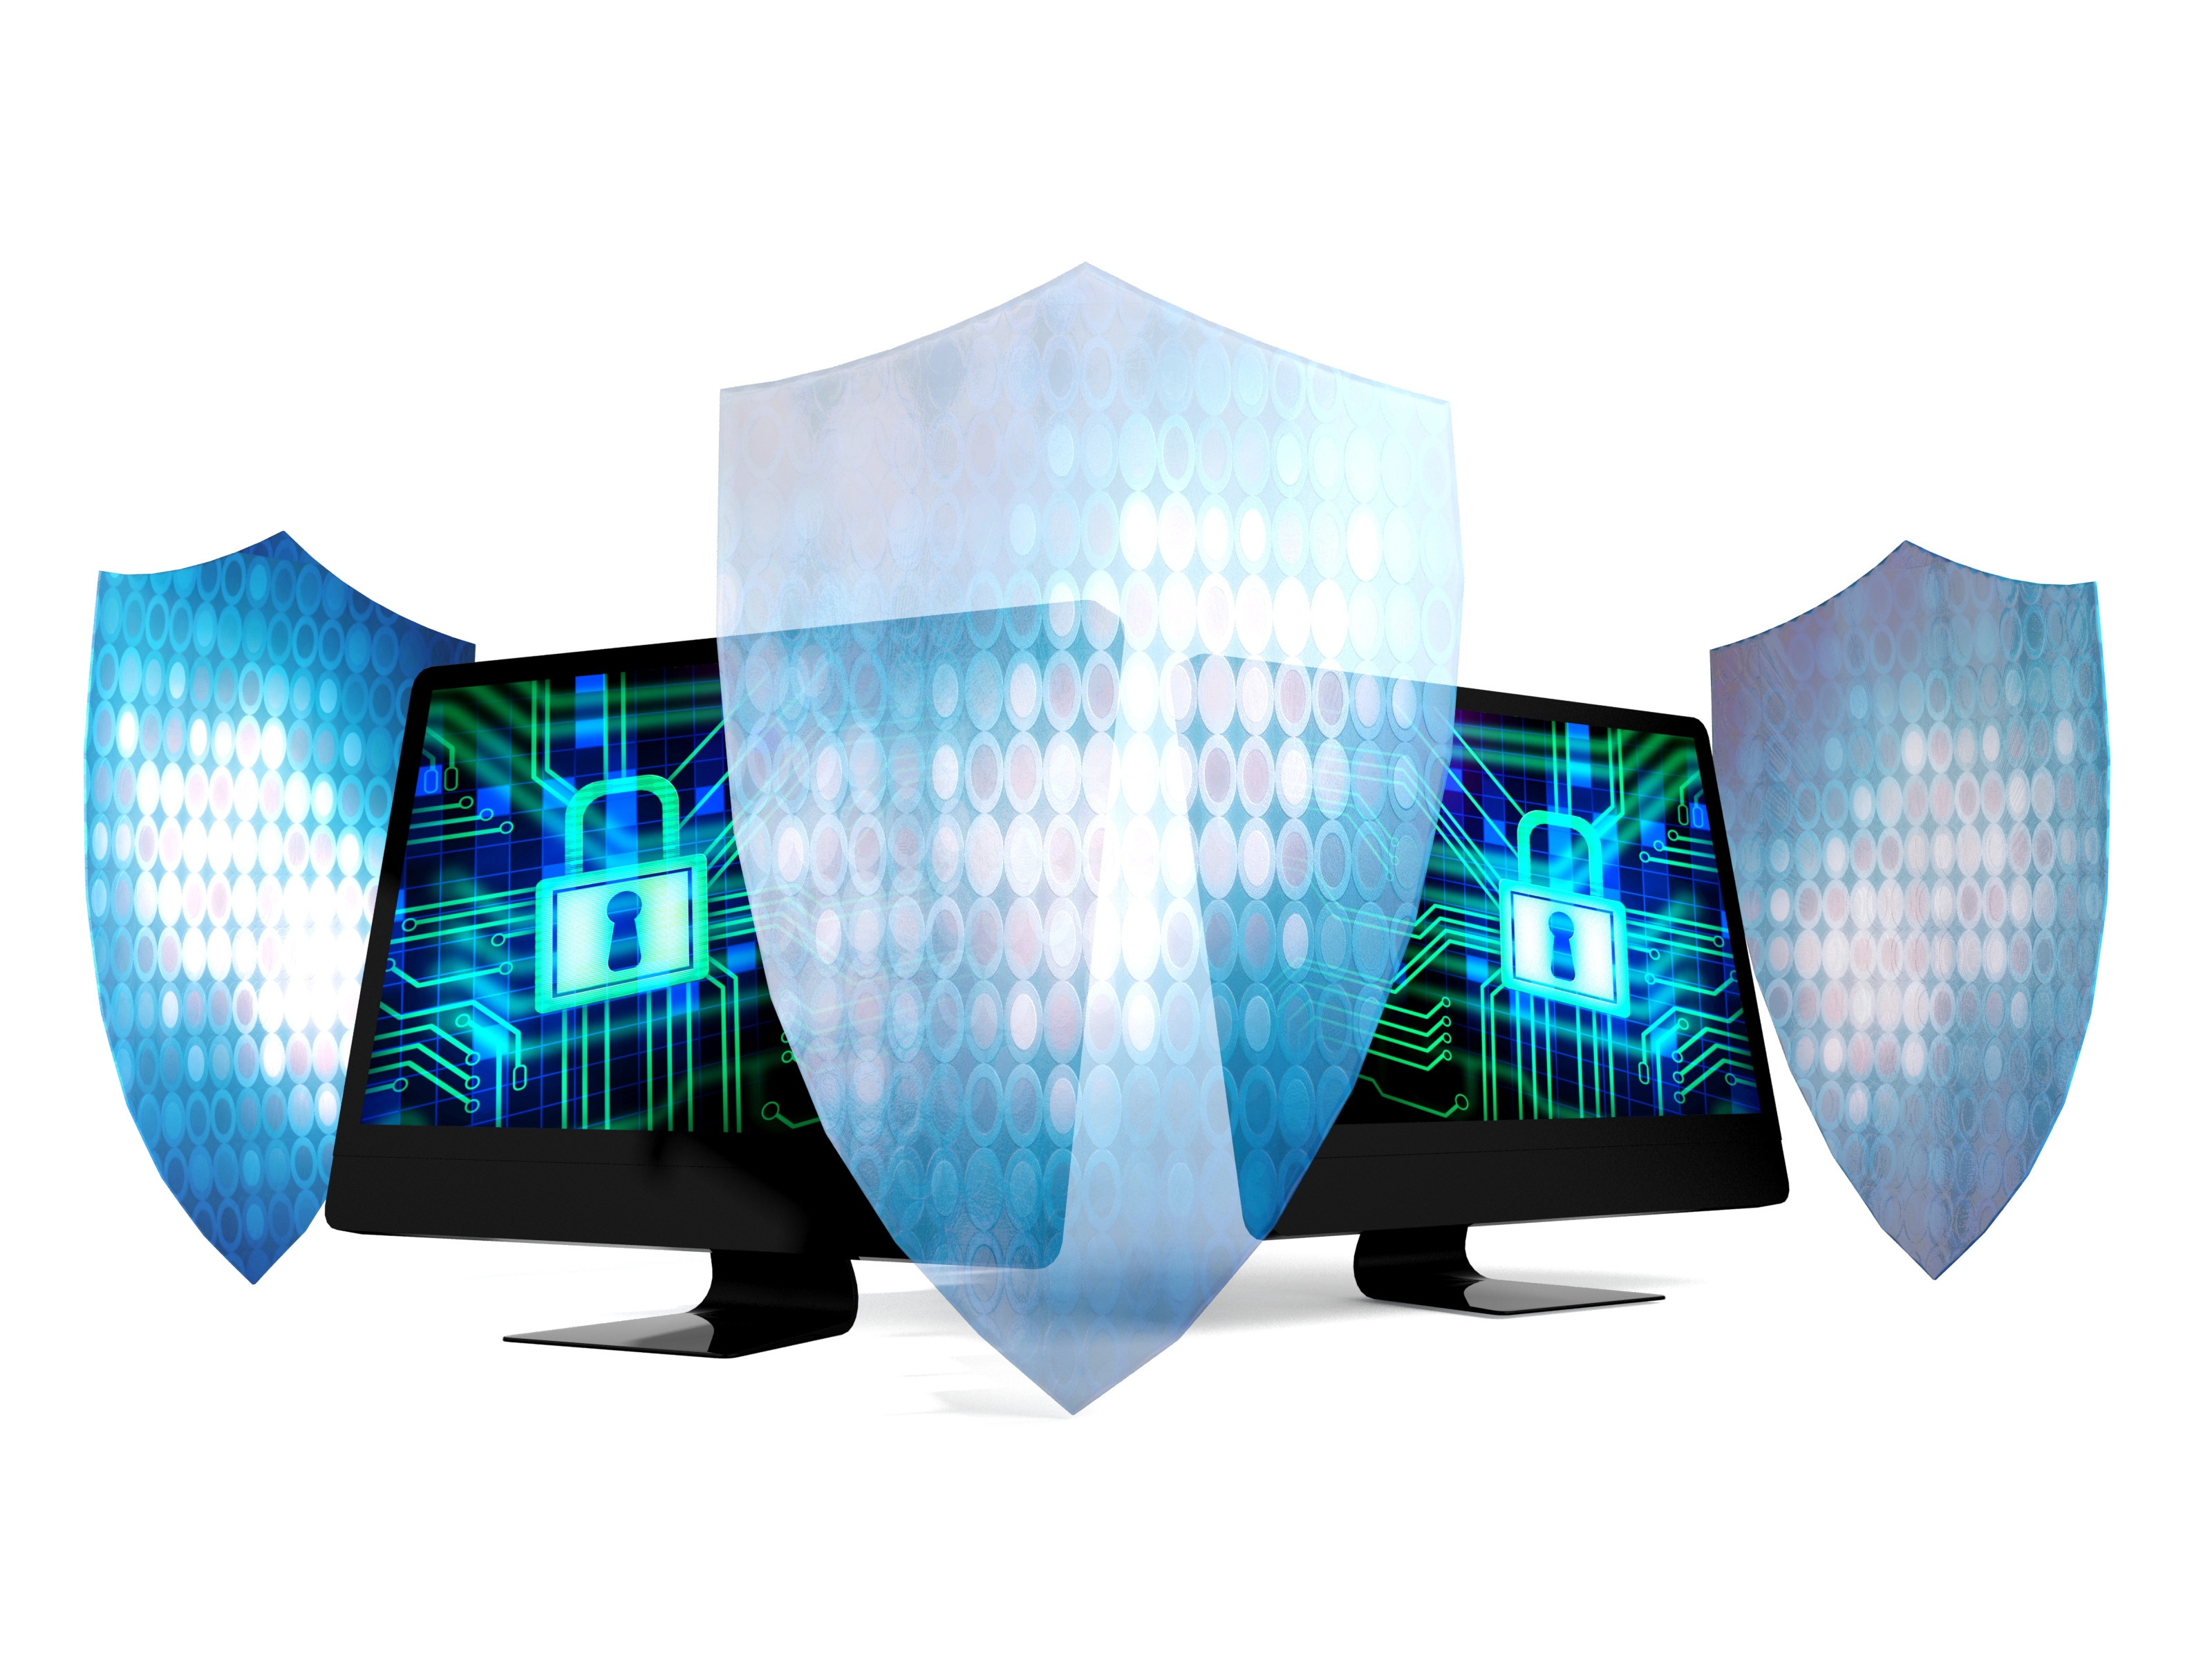 IT Guardian Shield and Computer Monitor AdobeStock_85366822.jpeg